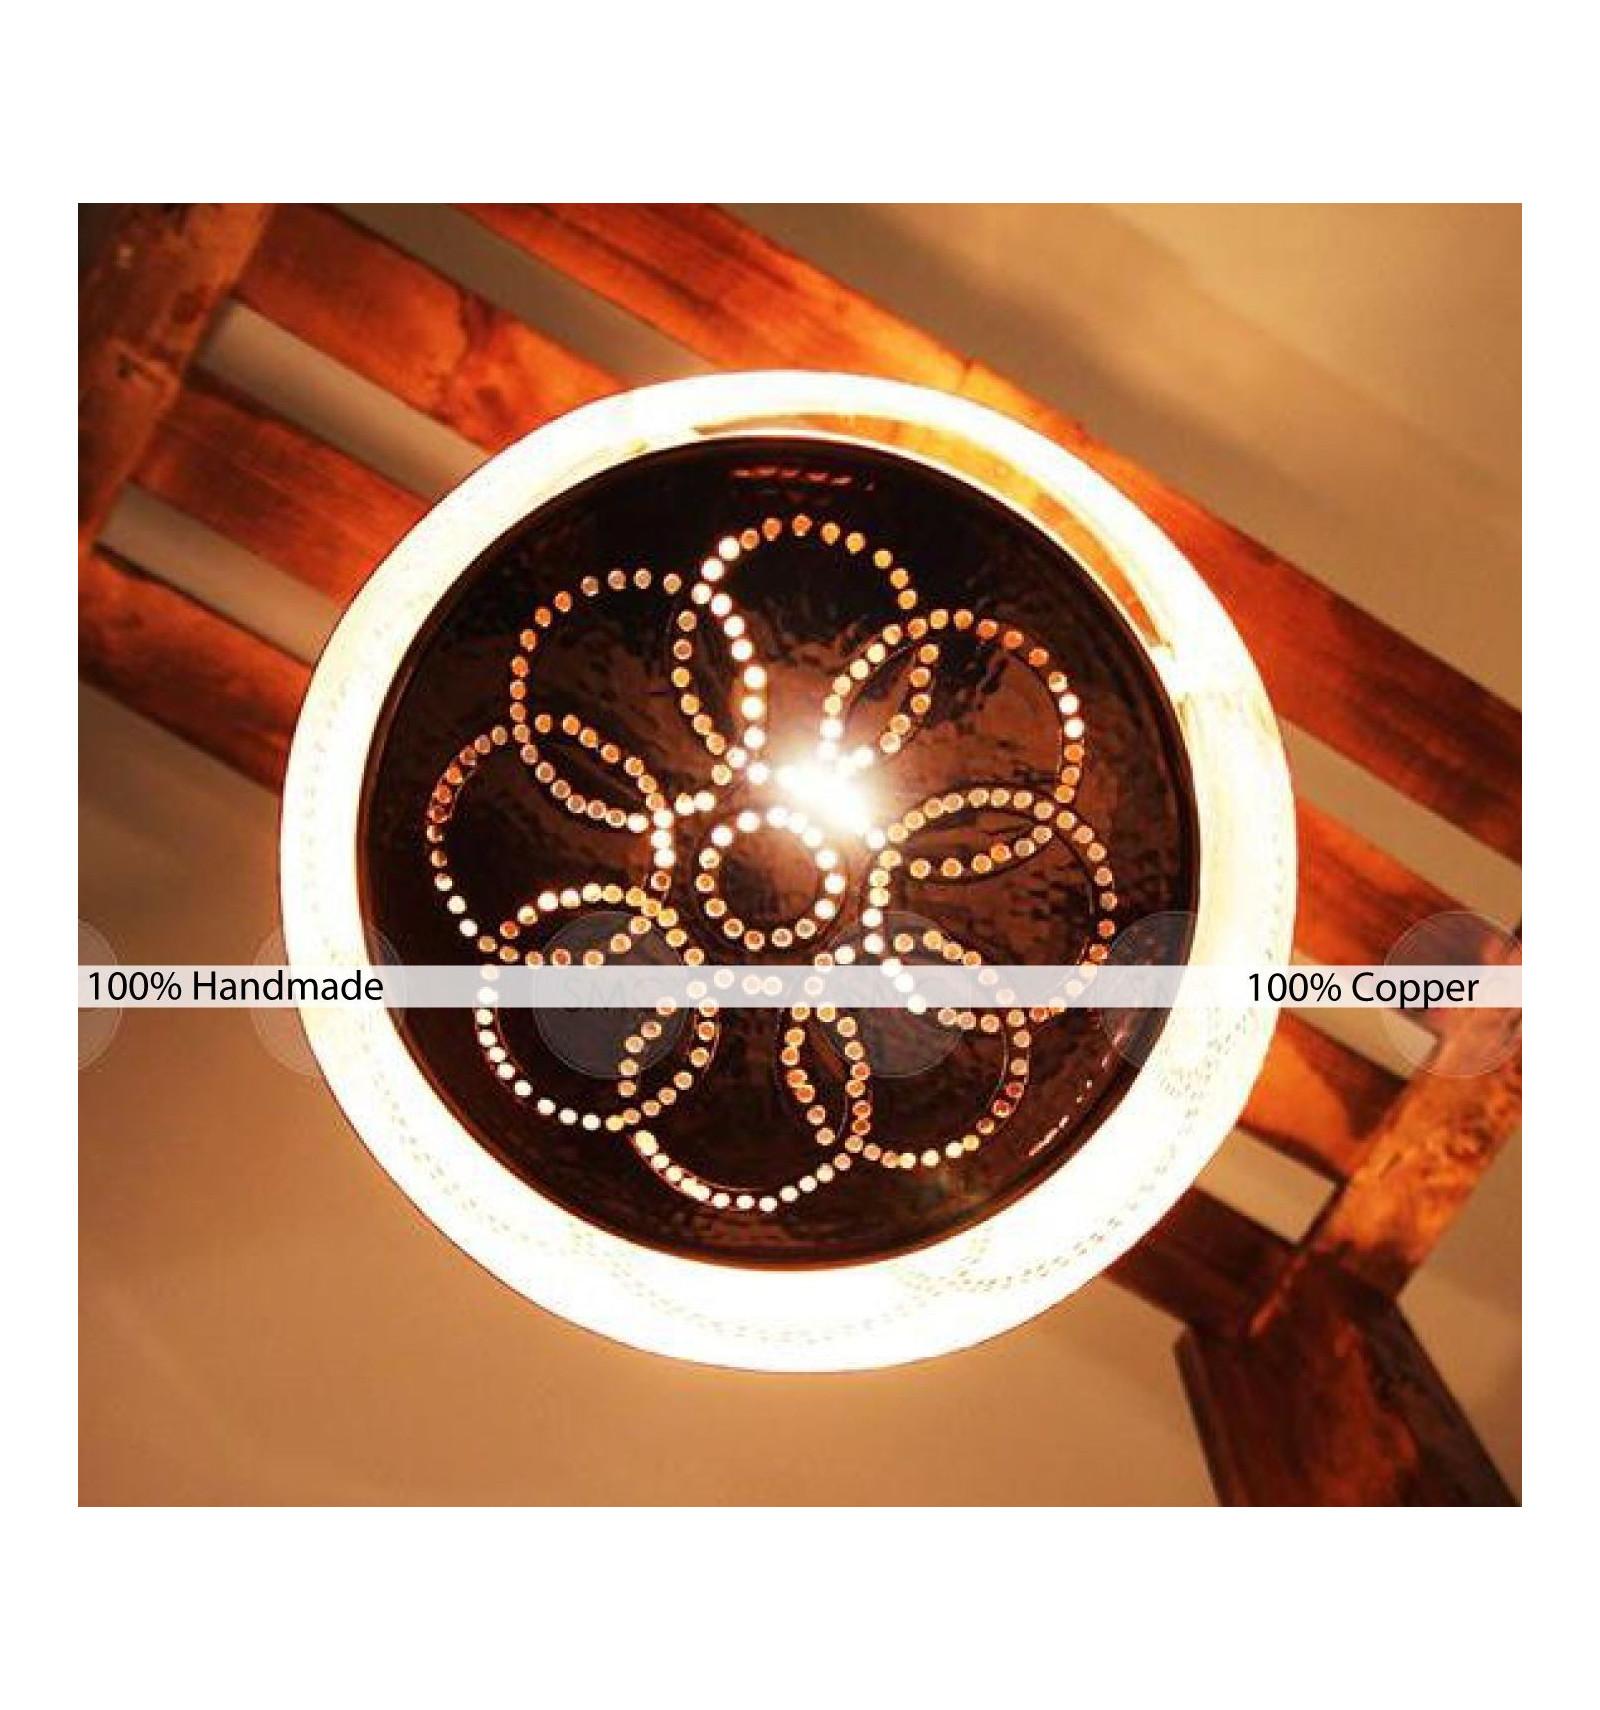 suspension luminaire en cuivre galaxy lartisanet. Black Bedroom Furniture Sets. Home Design Ideas